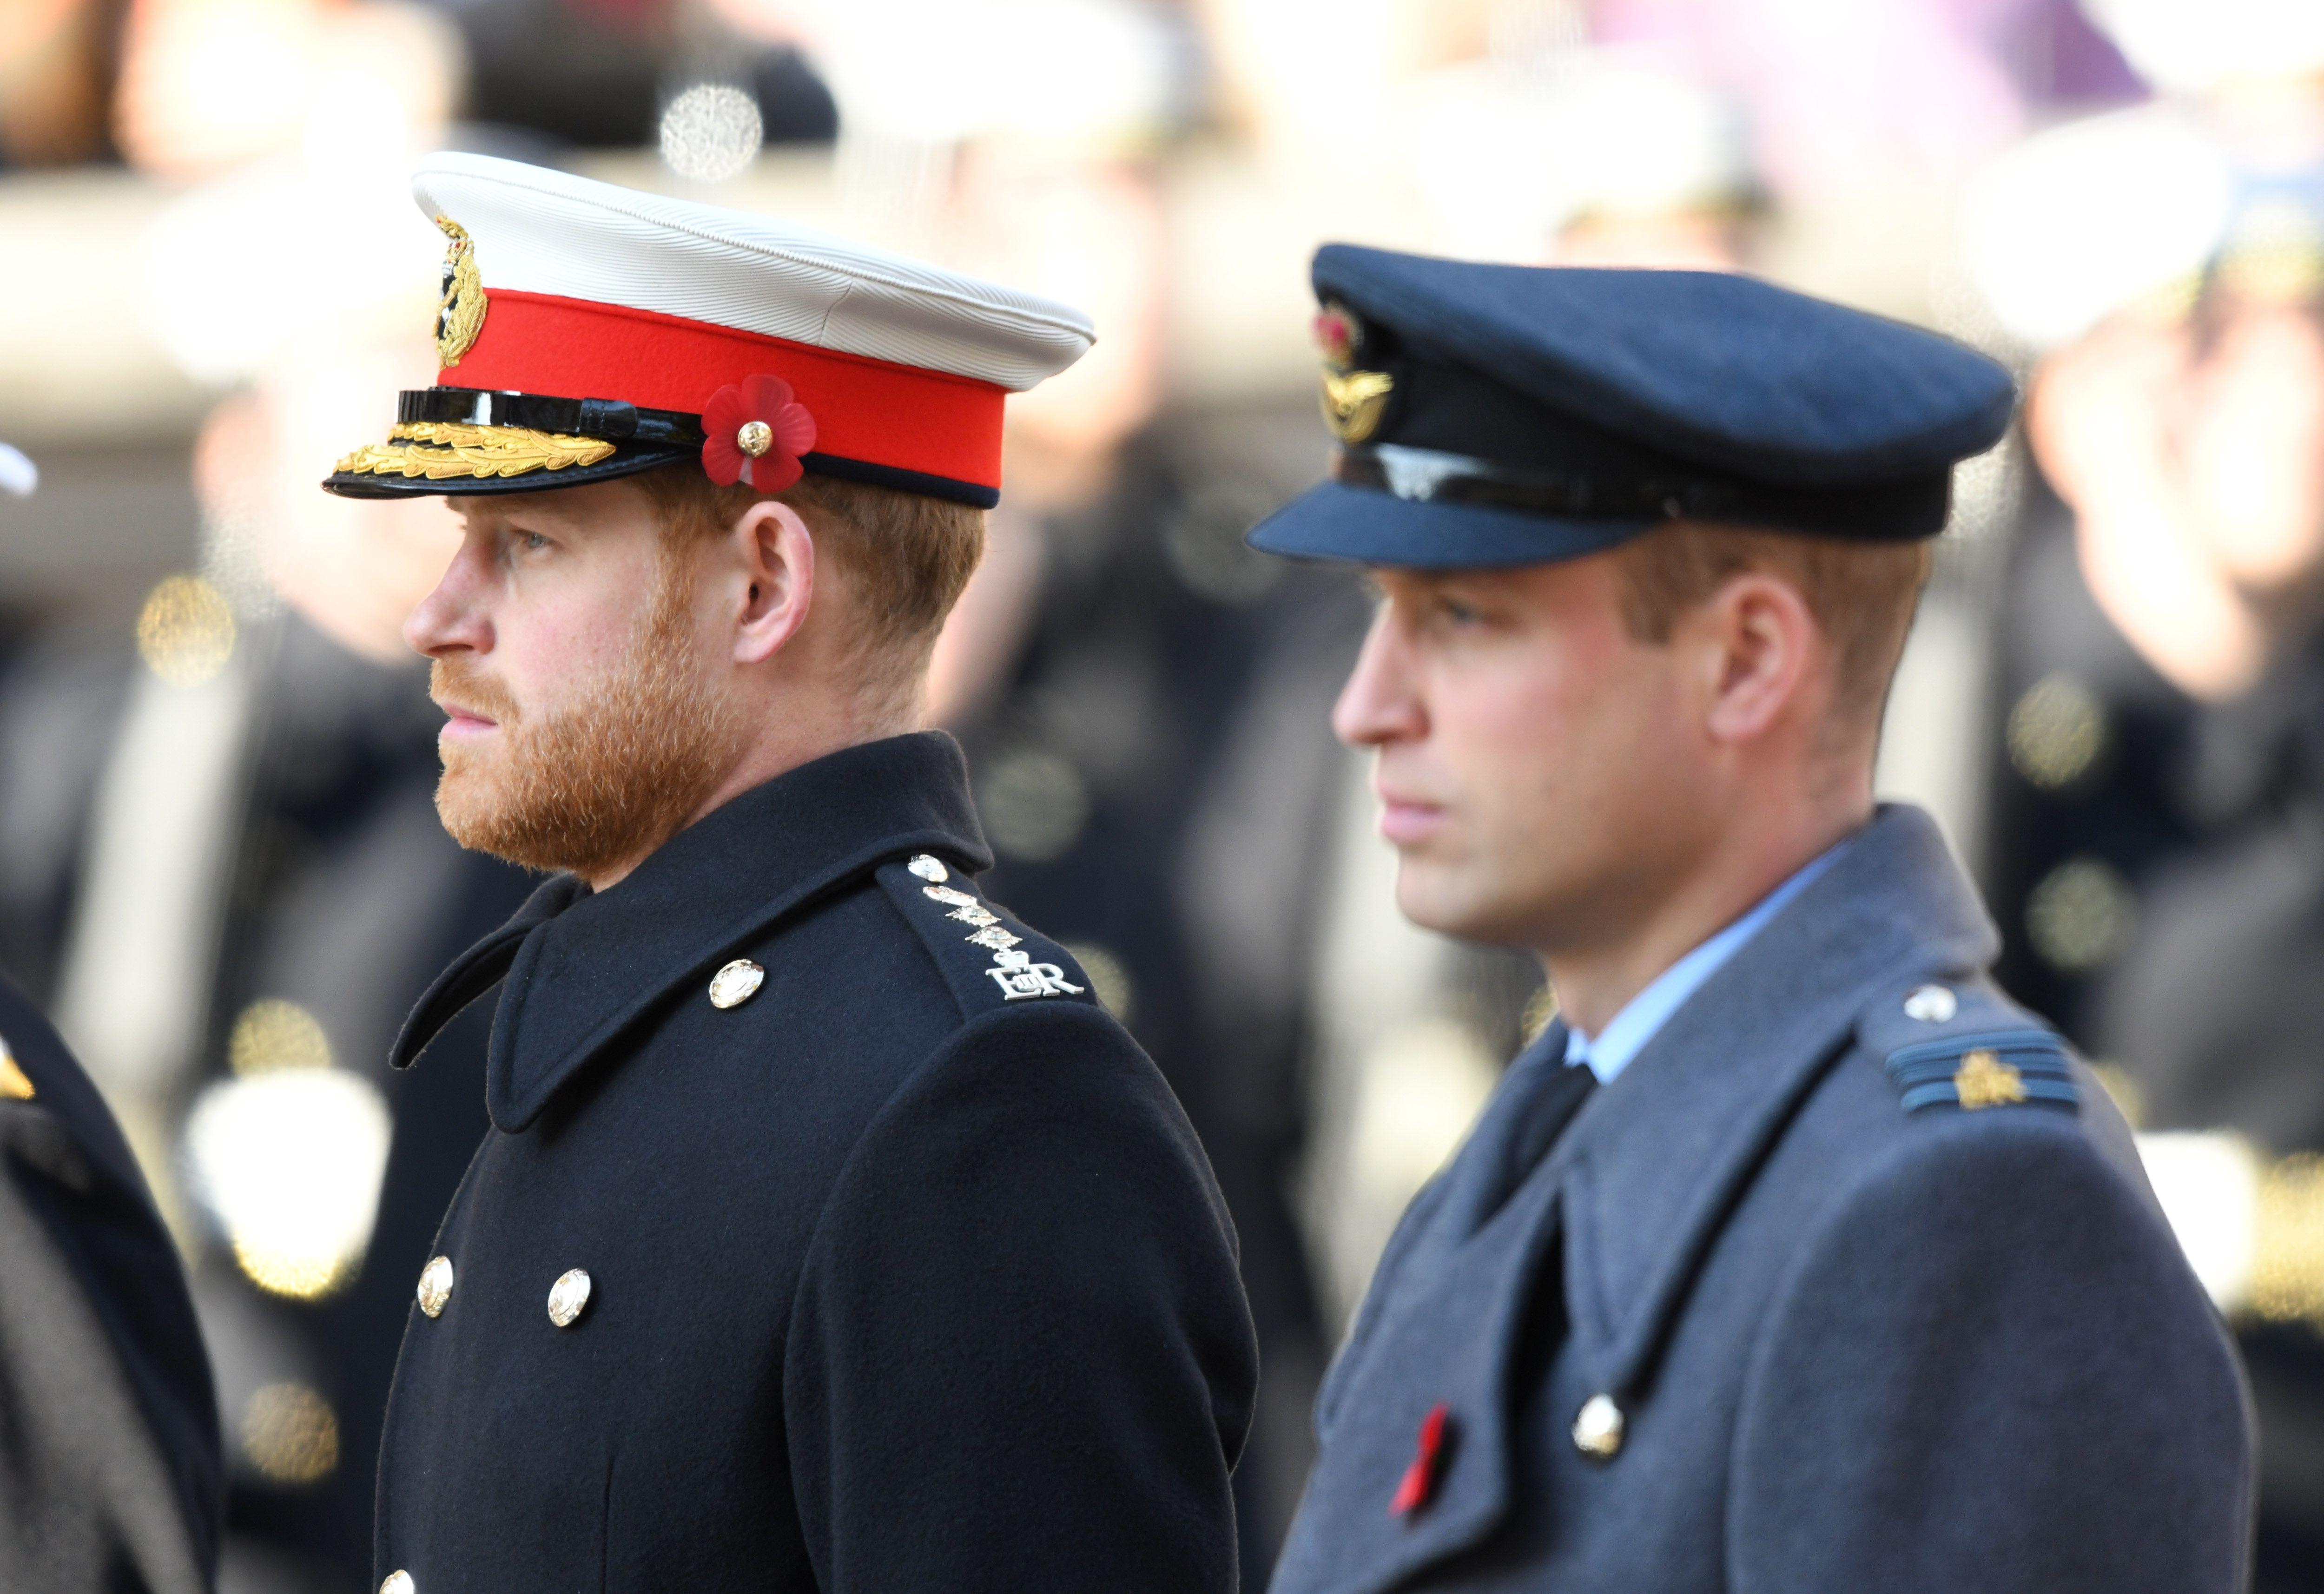 Wiliam and Harry in uniform